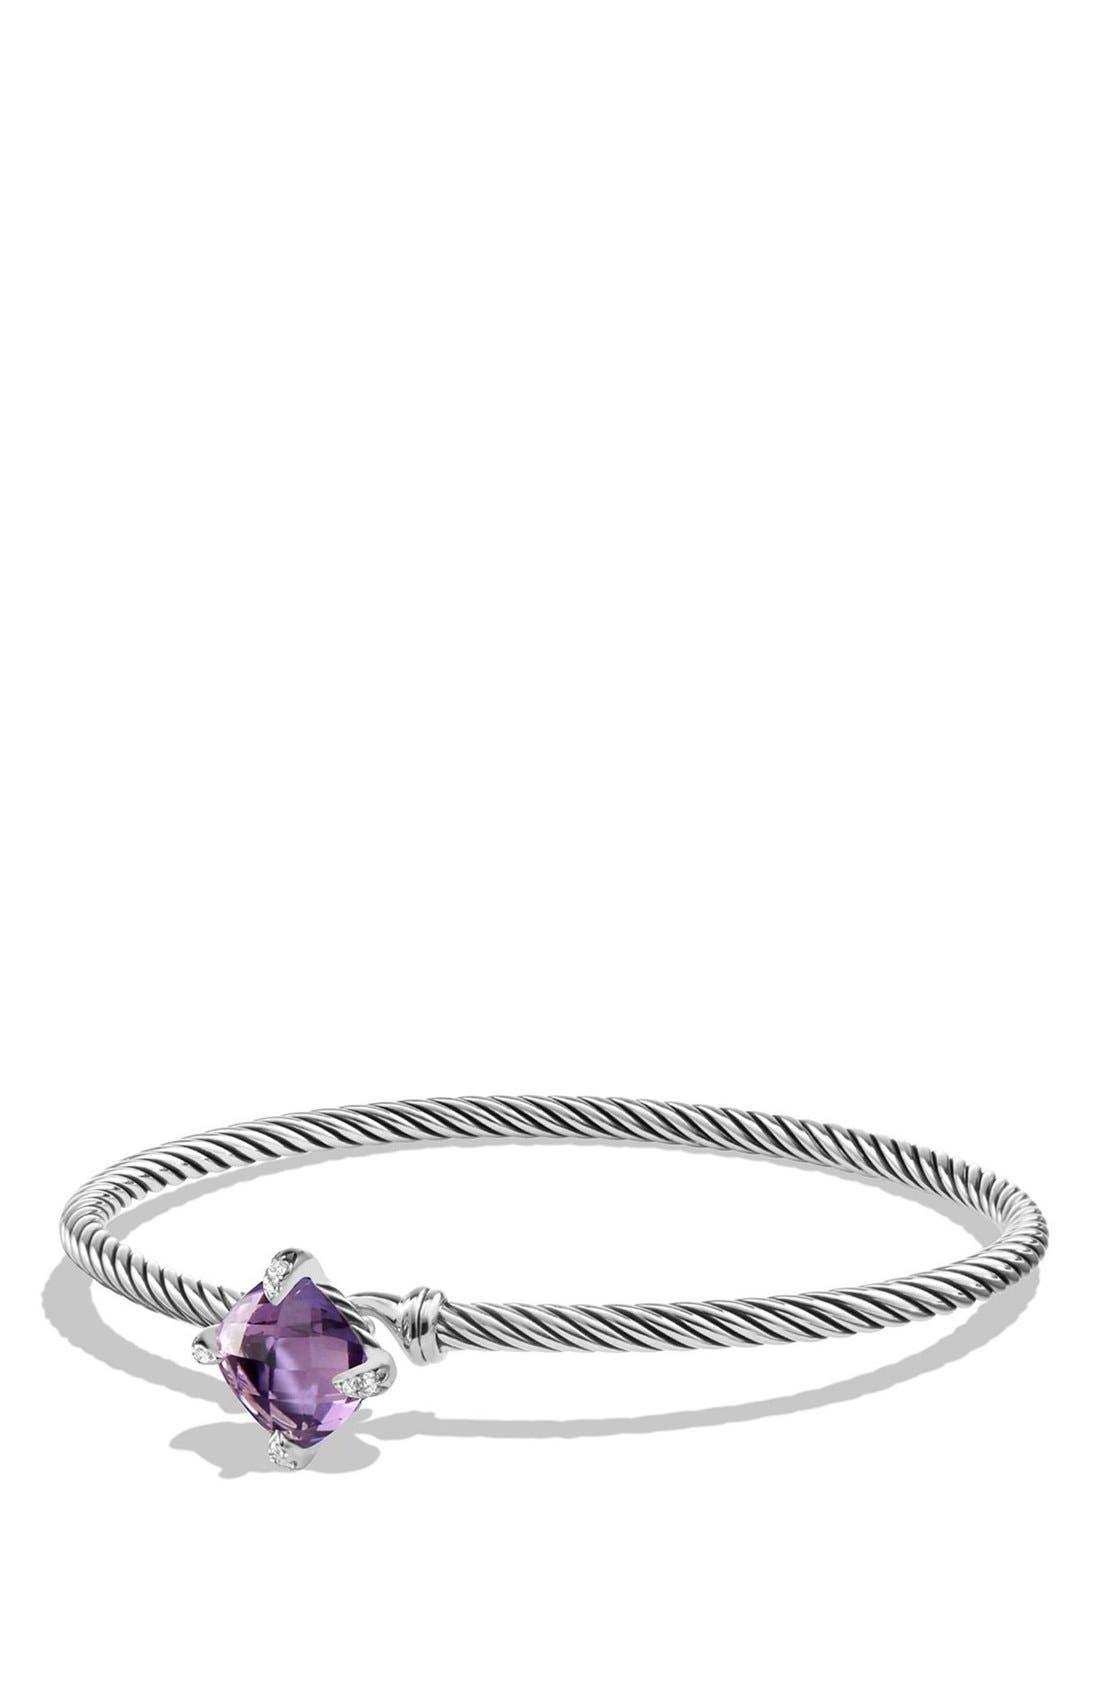 David Yurman 'Châtelaine' Bracelet with Diamonds